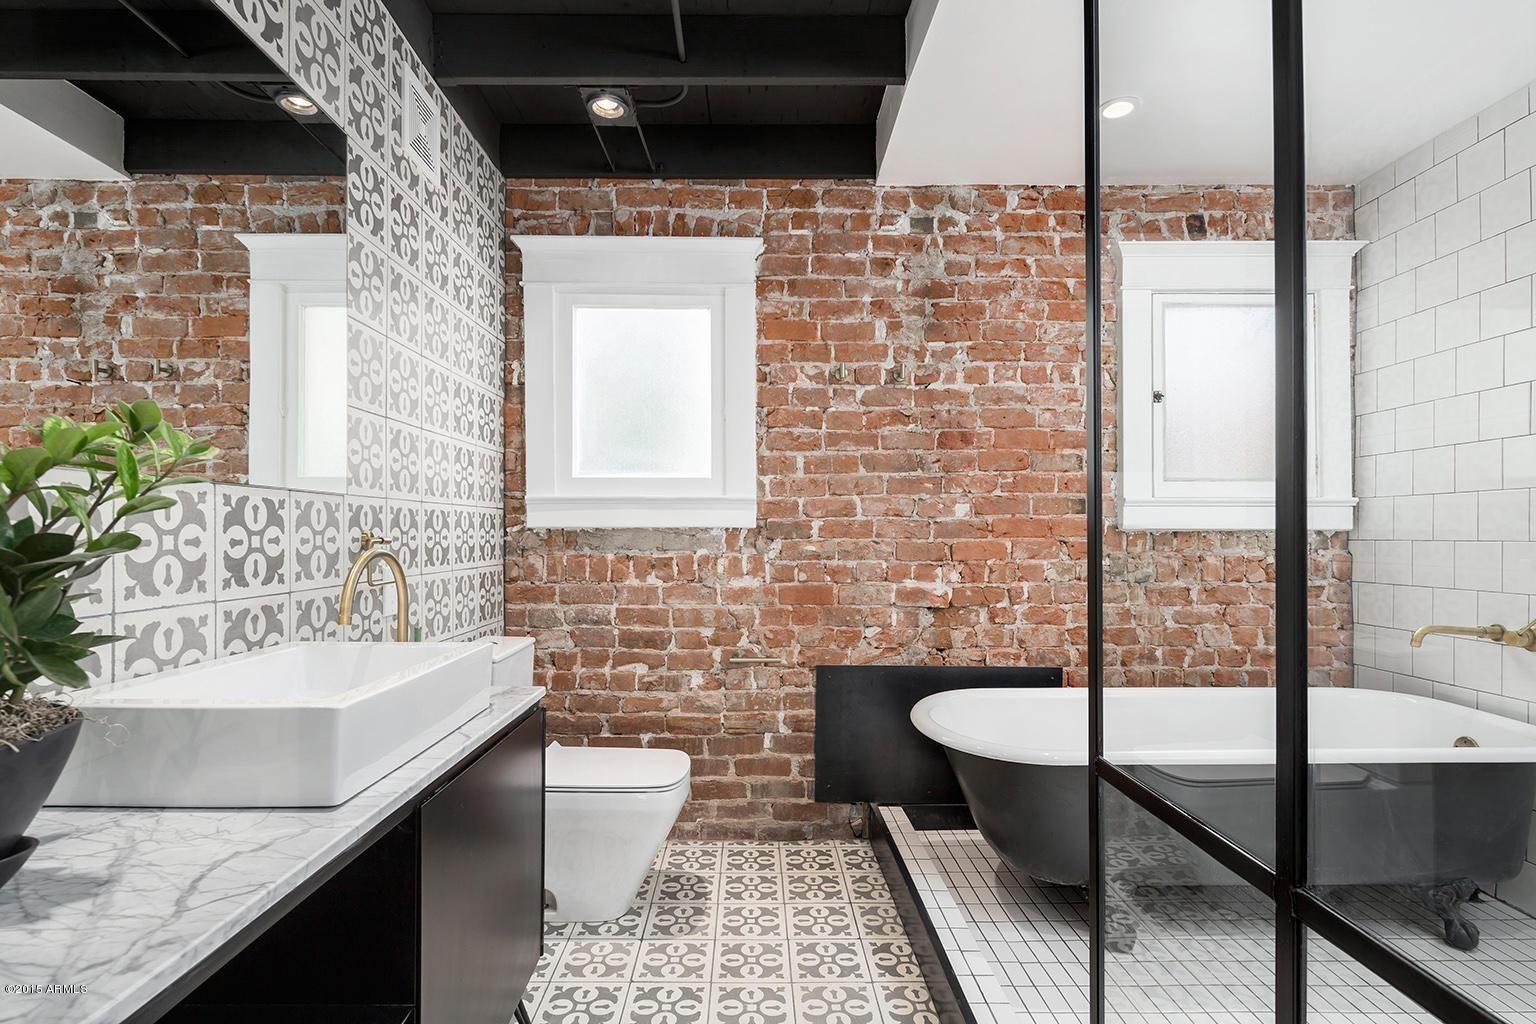 Exposed Brick Wall Modern Bungalow Style Brick Bathroom Brick Interior Wall Brick Interior